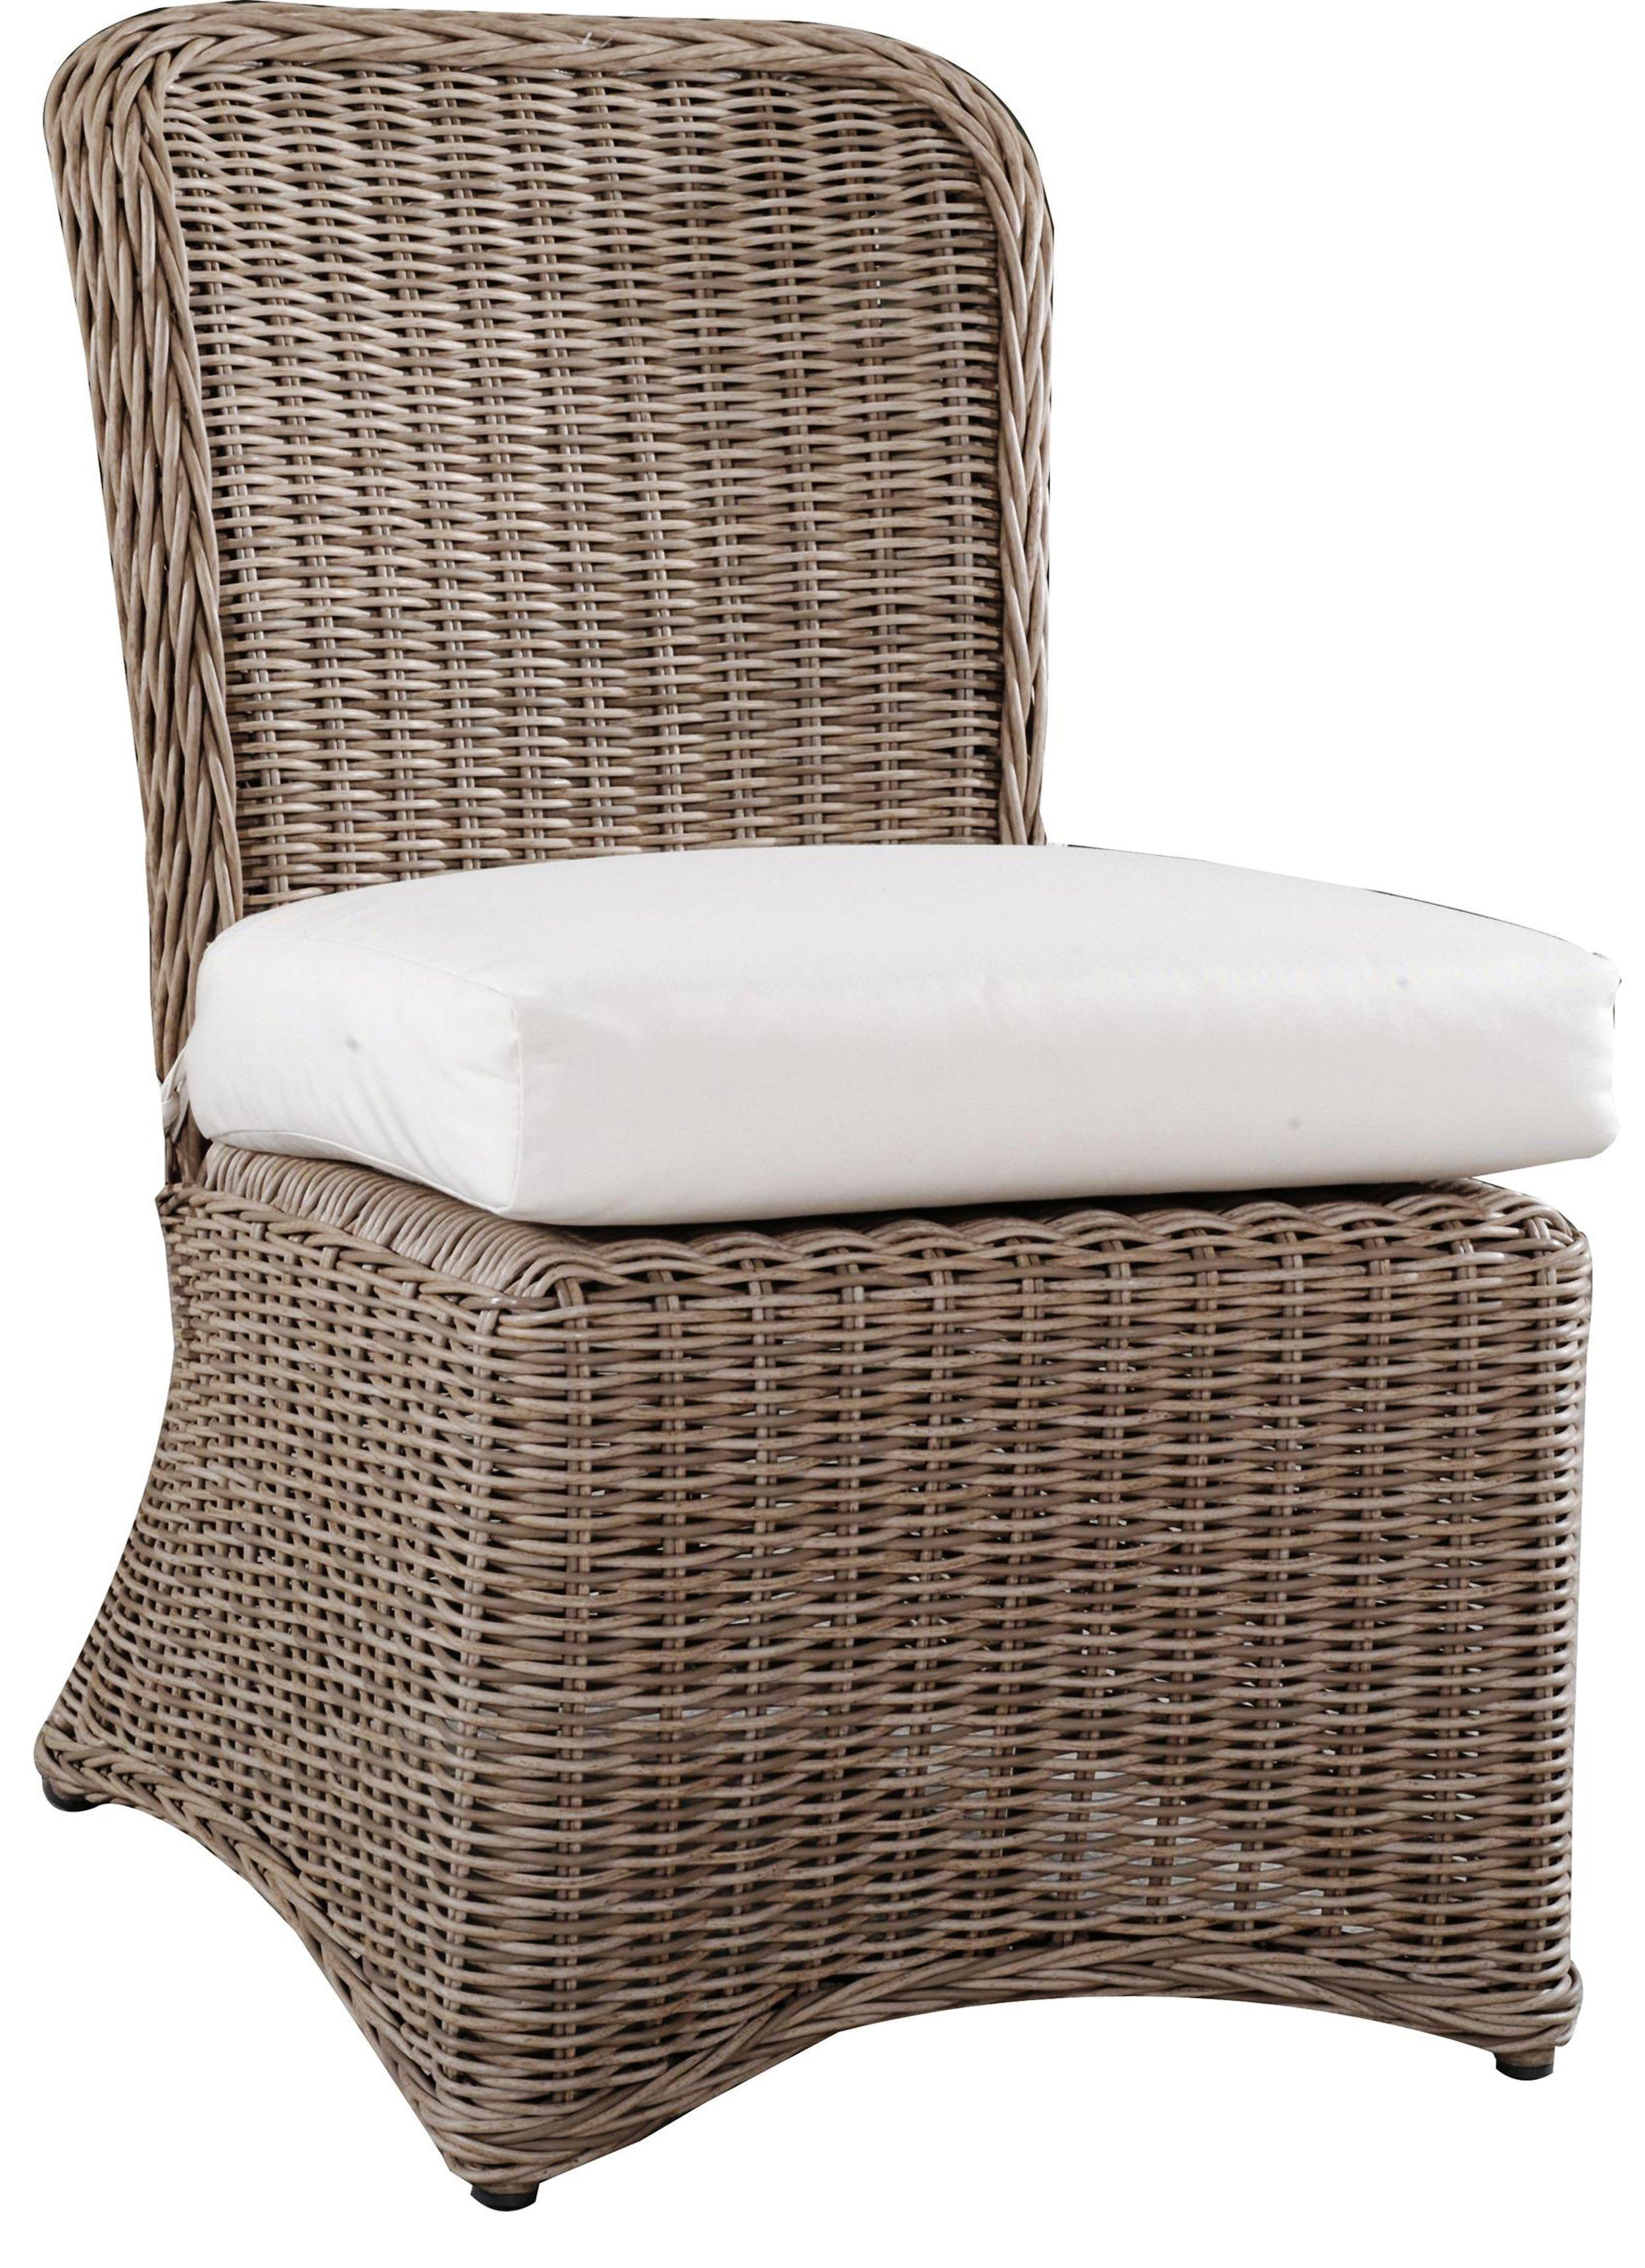 "971921 West Hampton Dining Chair   27.6"" x 28.5"" x 35"""